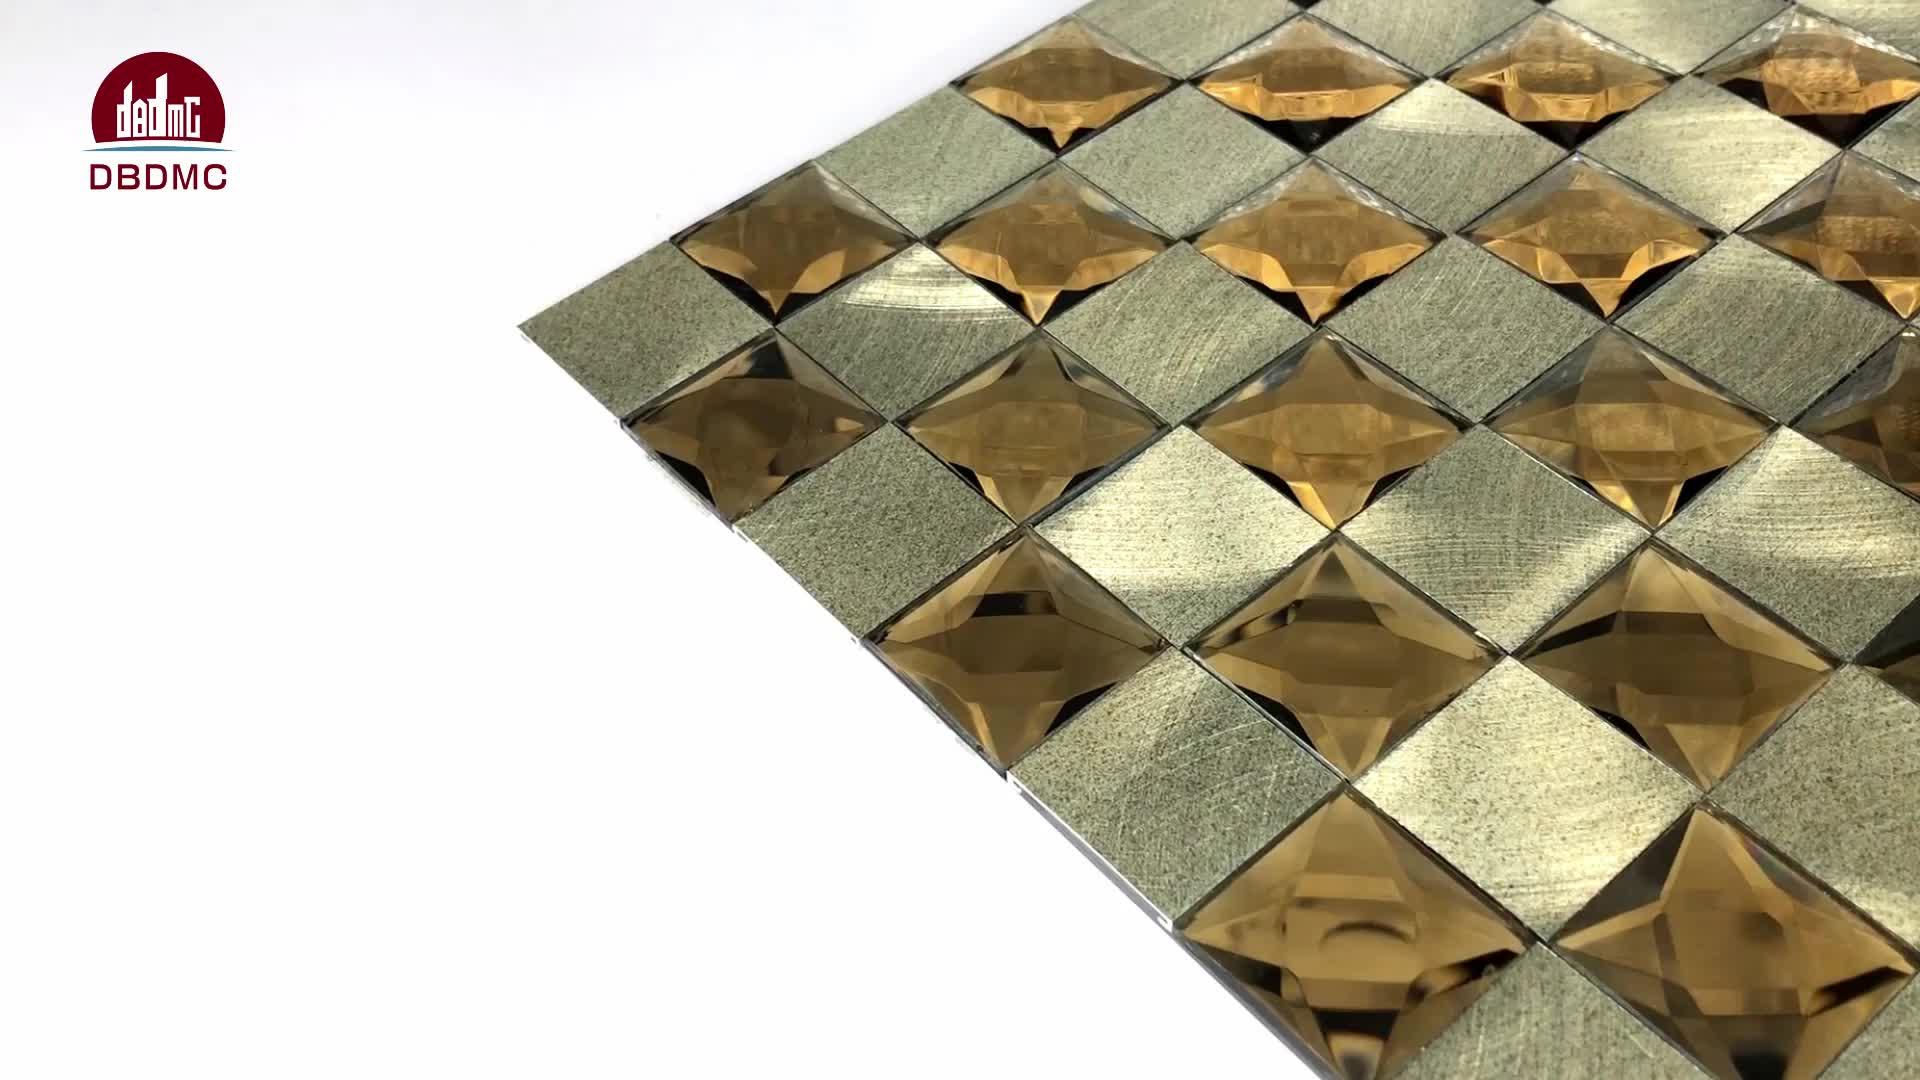 2019 Nieuwste Foshan Fabriek Curve backsplash tegels mozaïek, Curve Mozaïek, Curve Glas Mozaïek